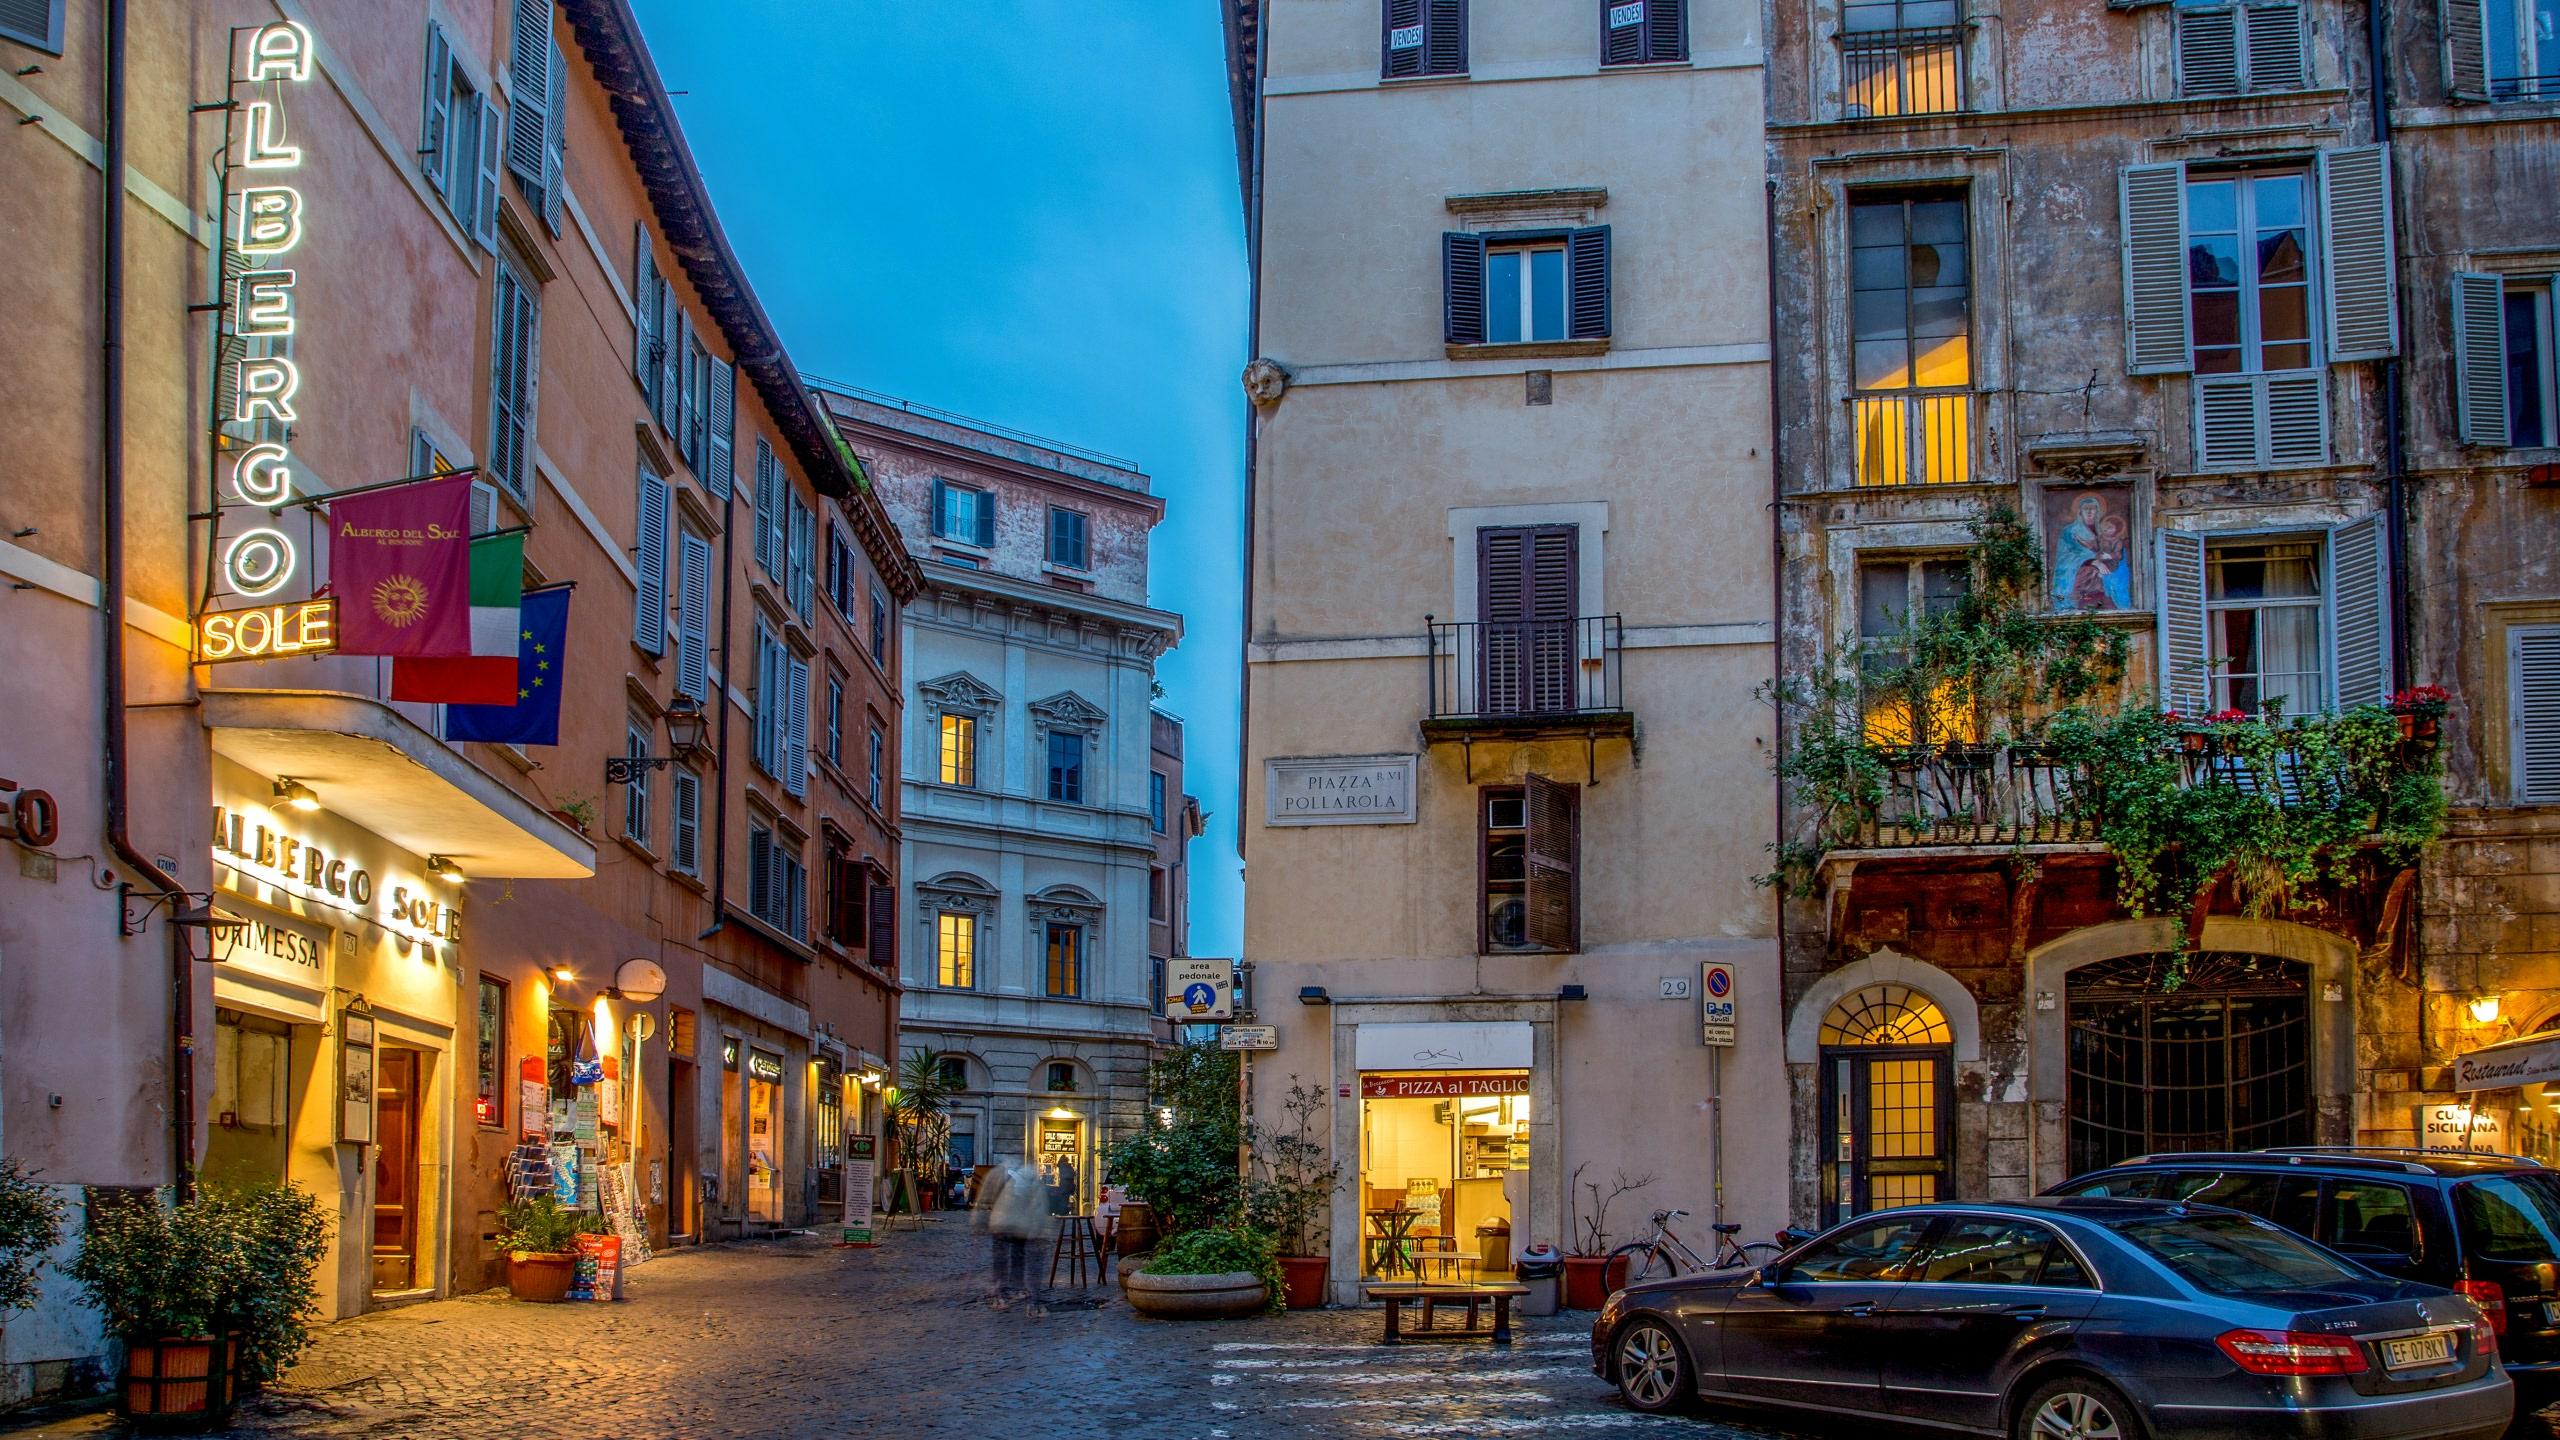 hotel-sole-roma-externo01